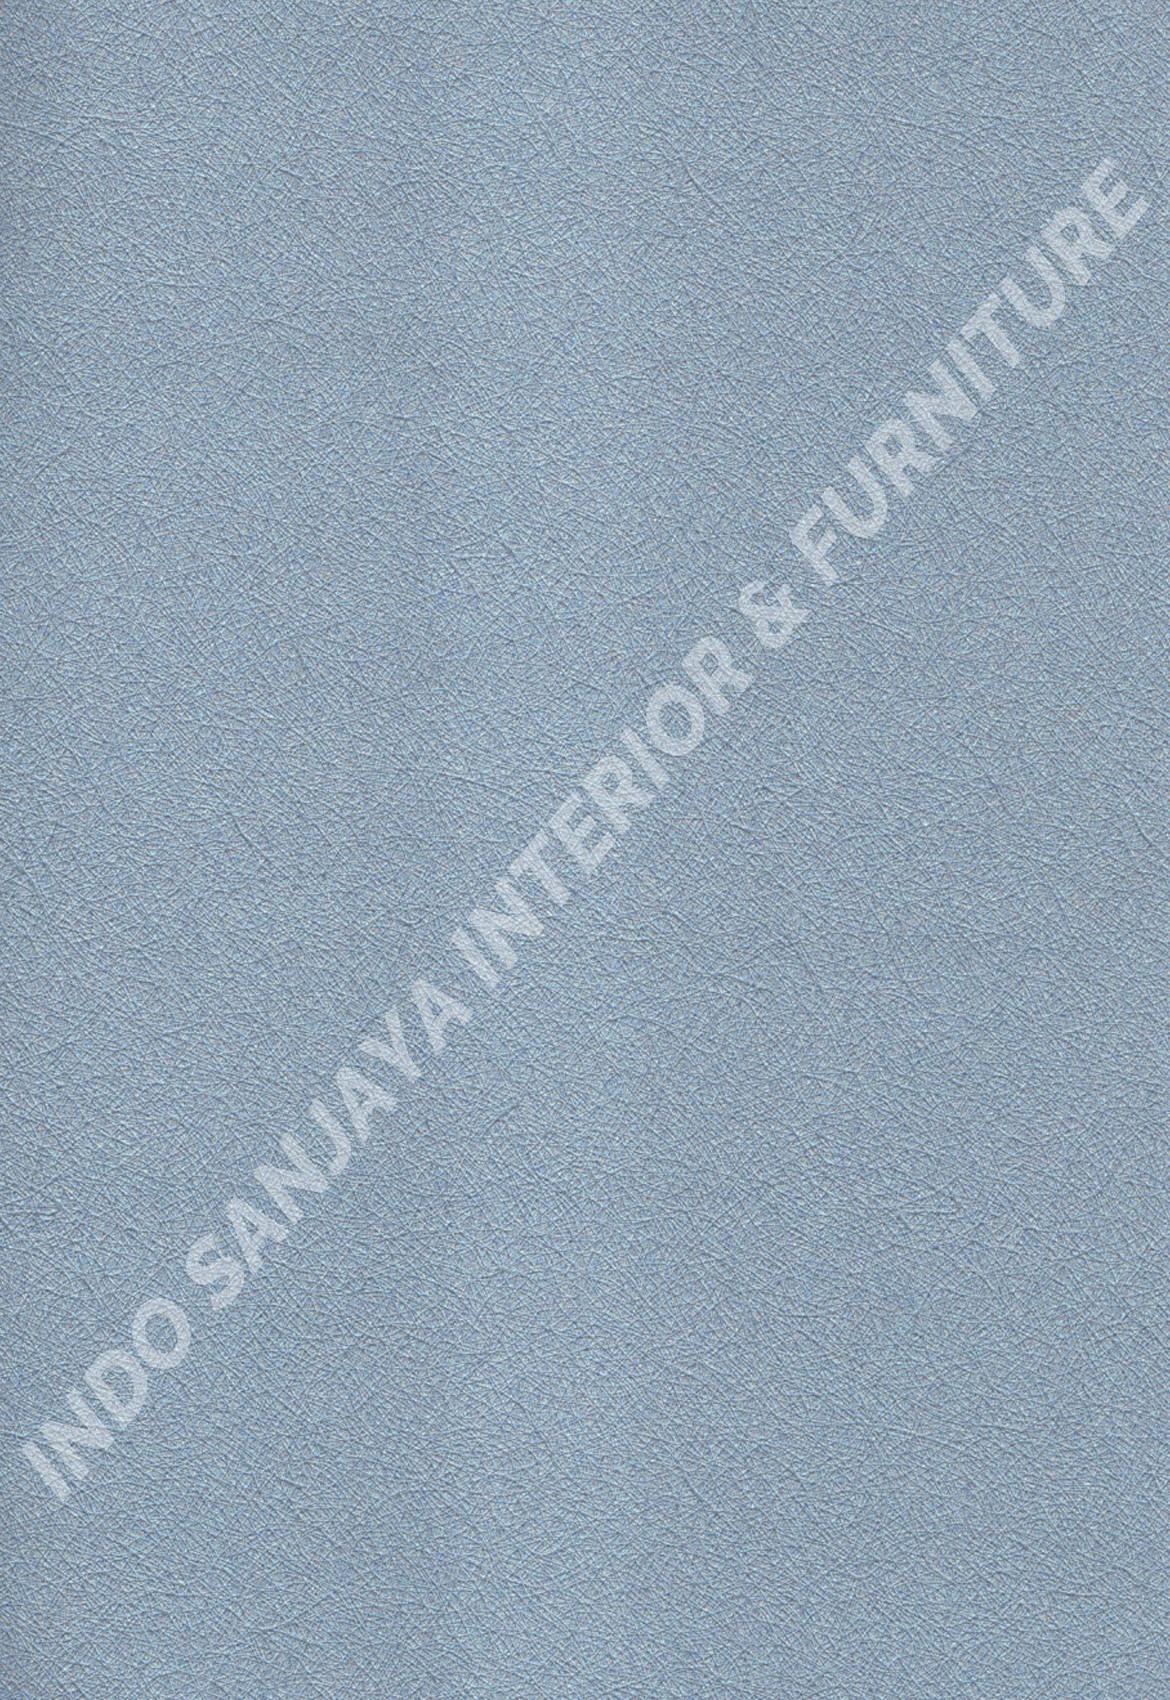 wallpaper   Wallpaper Minimalis Polos 83129-6:83129-6 corak  warna